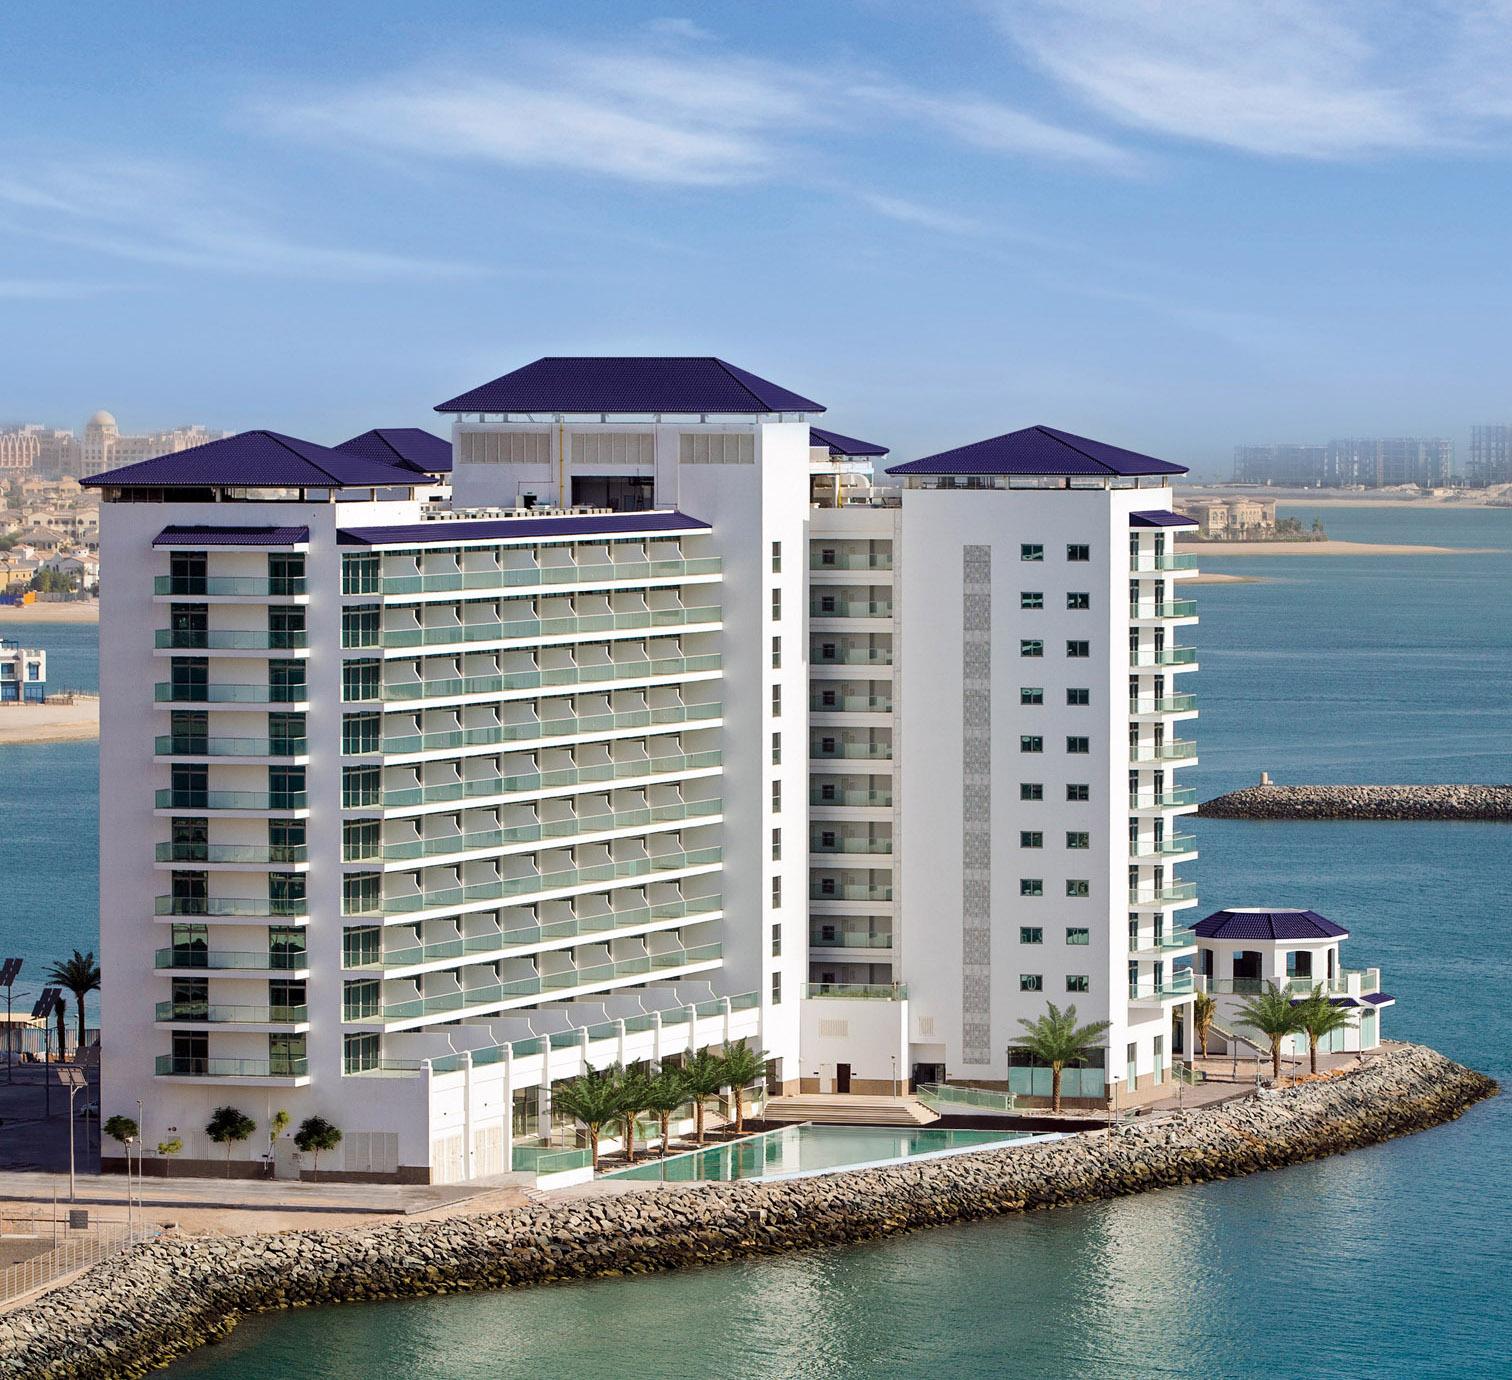 Stunning Homes With Fabulous Views Of The Arabian Gulf In Dubai